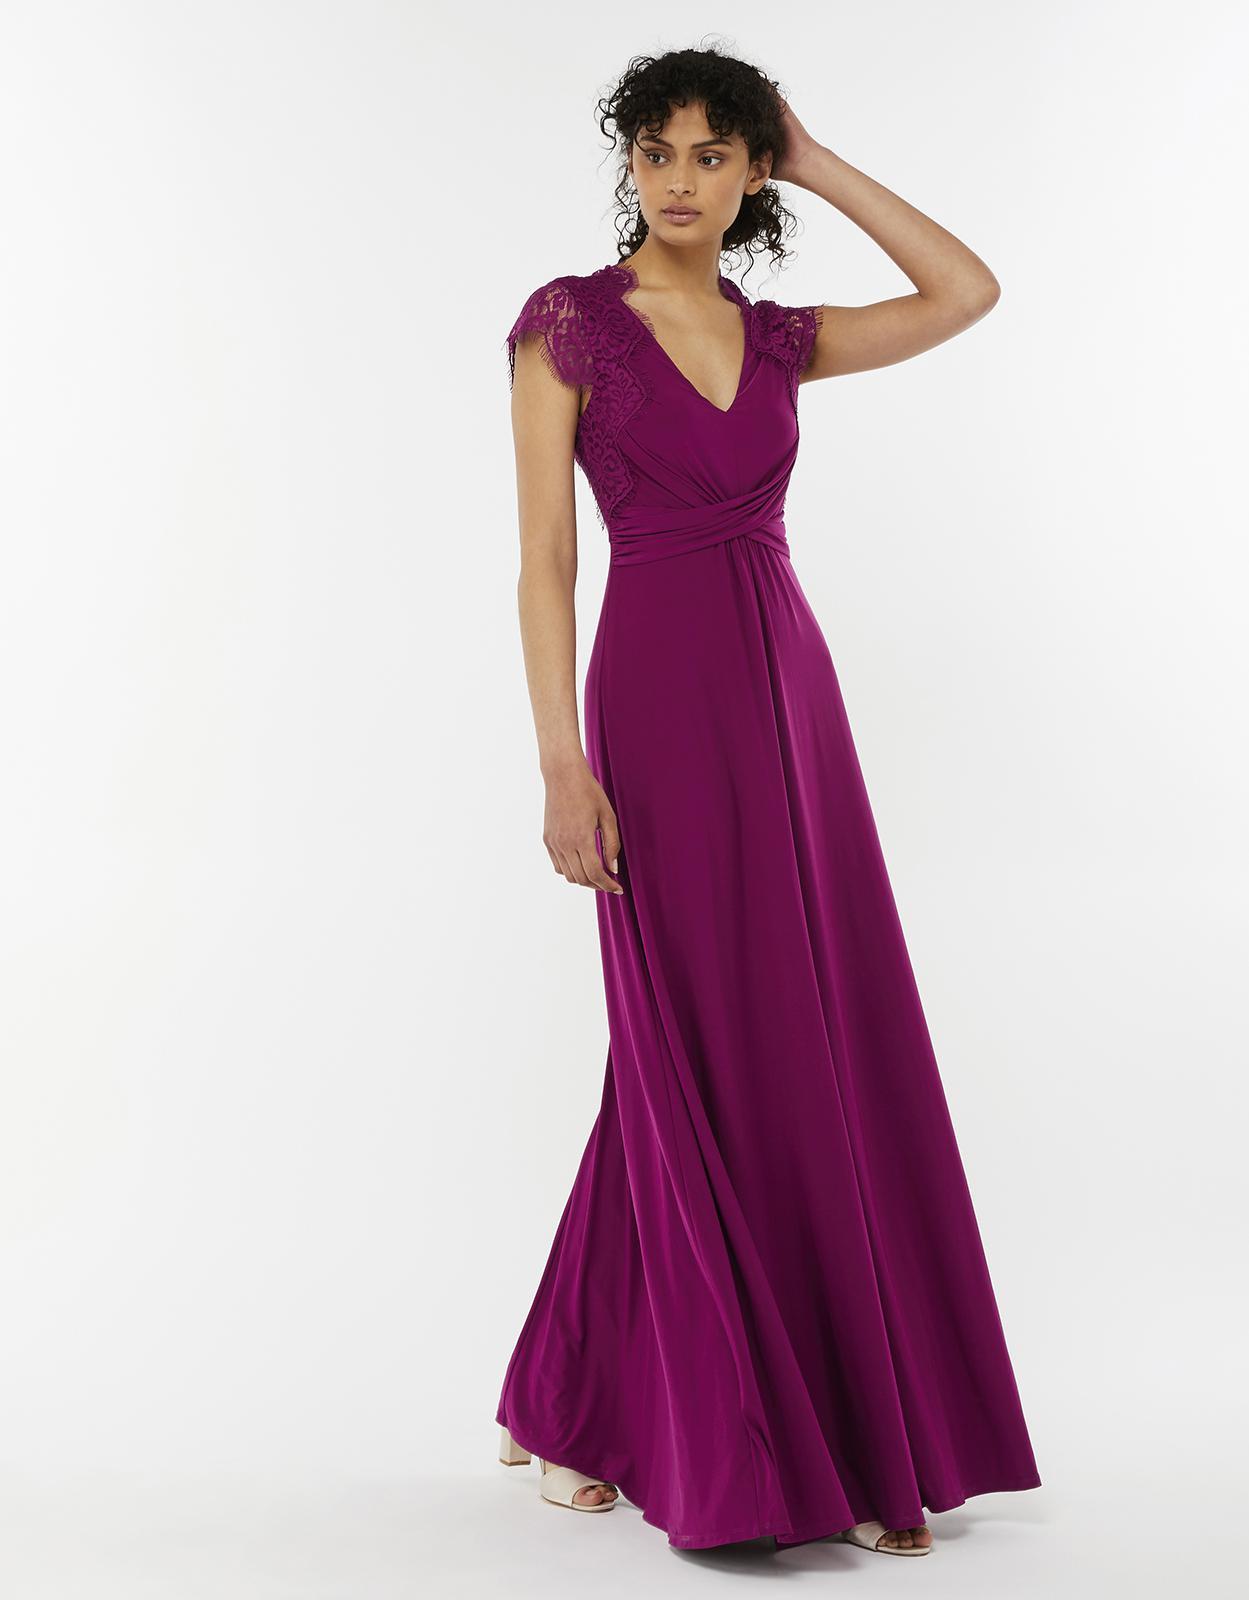 Monsoon Gwendoline Lace Maxi Dress in Purple - Lyst